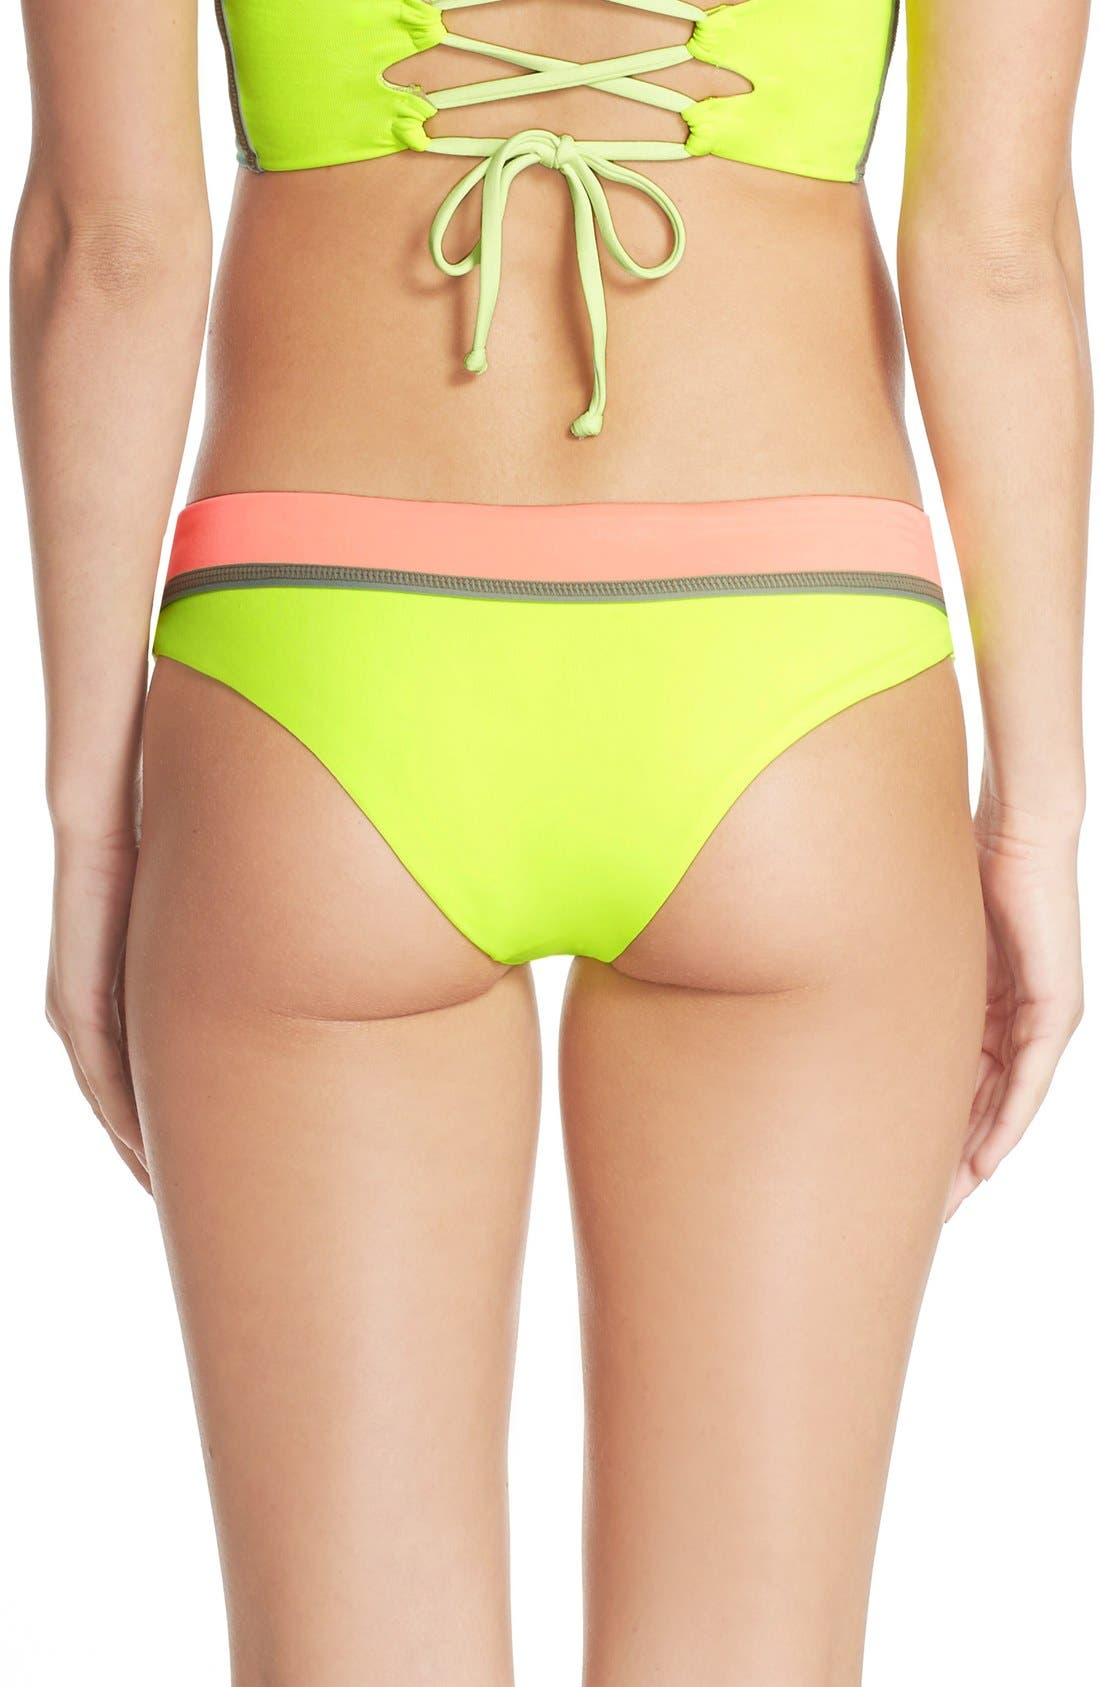 Alternate Image 1 Selected - Maaji 'Lime Cubism' Reversible Bikini Bottoms